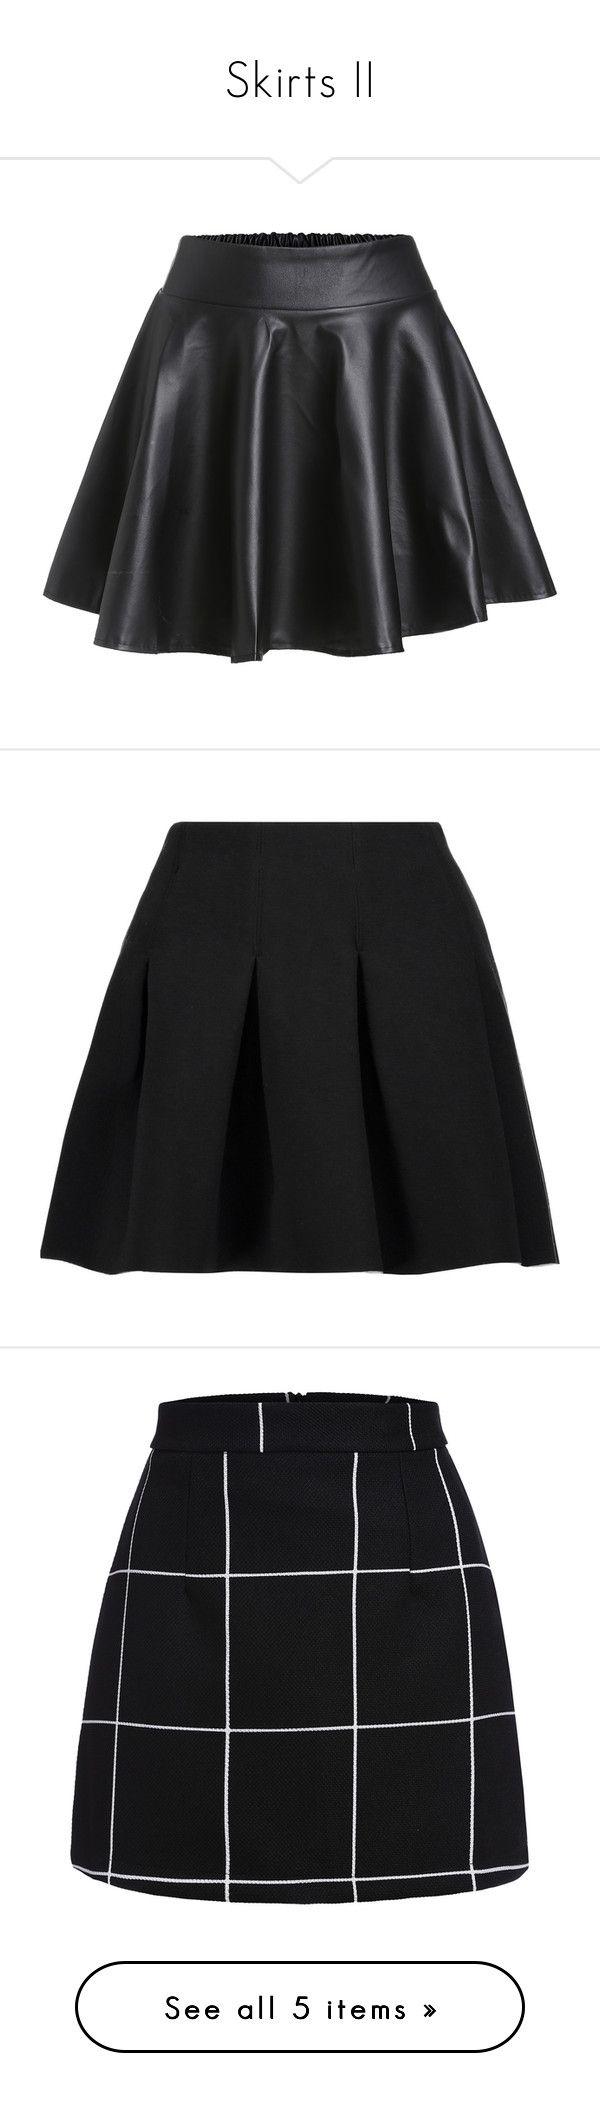 """Skirts II"" by rafakeka on Polyvore featuring skirts, mini skirts, bottoms, black, jupes, saias, flared skirt, elastic waist mini skirt, faux leather flared skirt e elastic waist circle skirt"